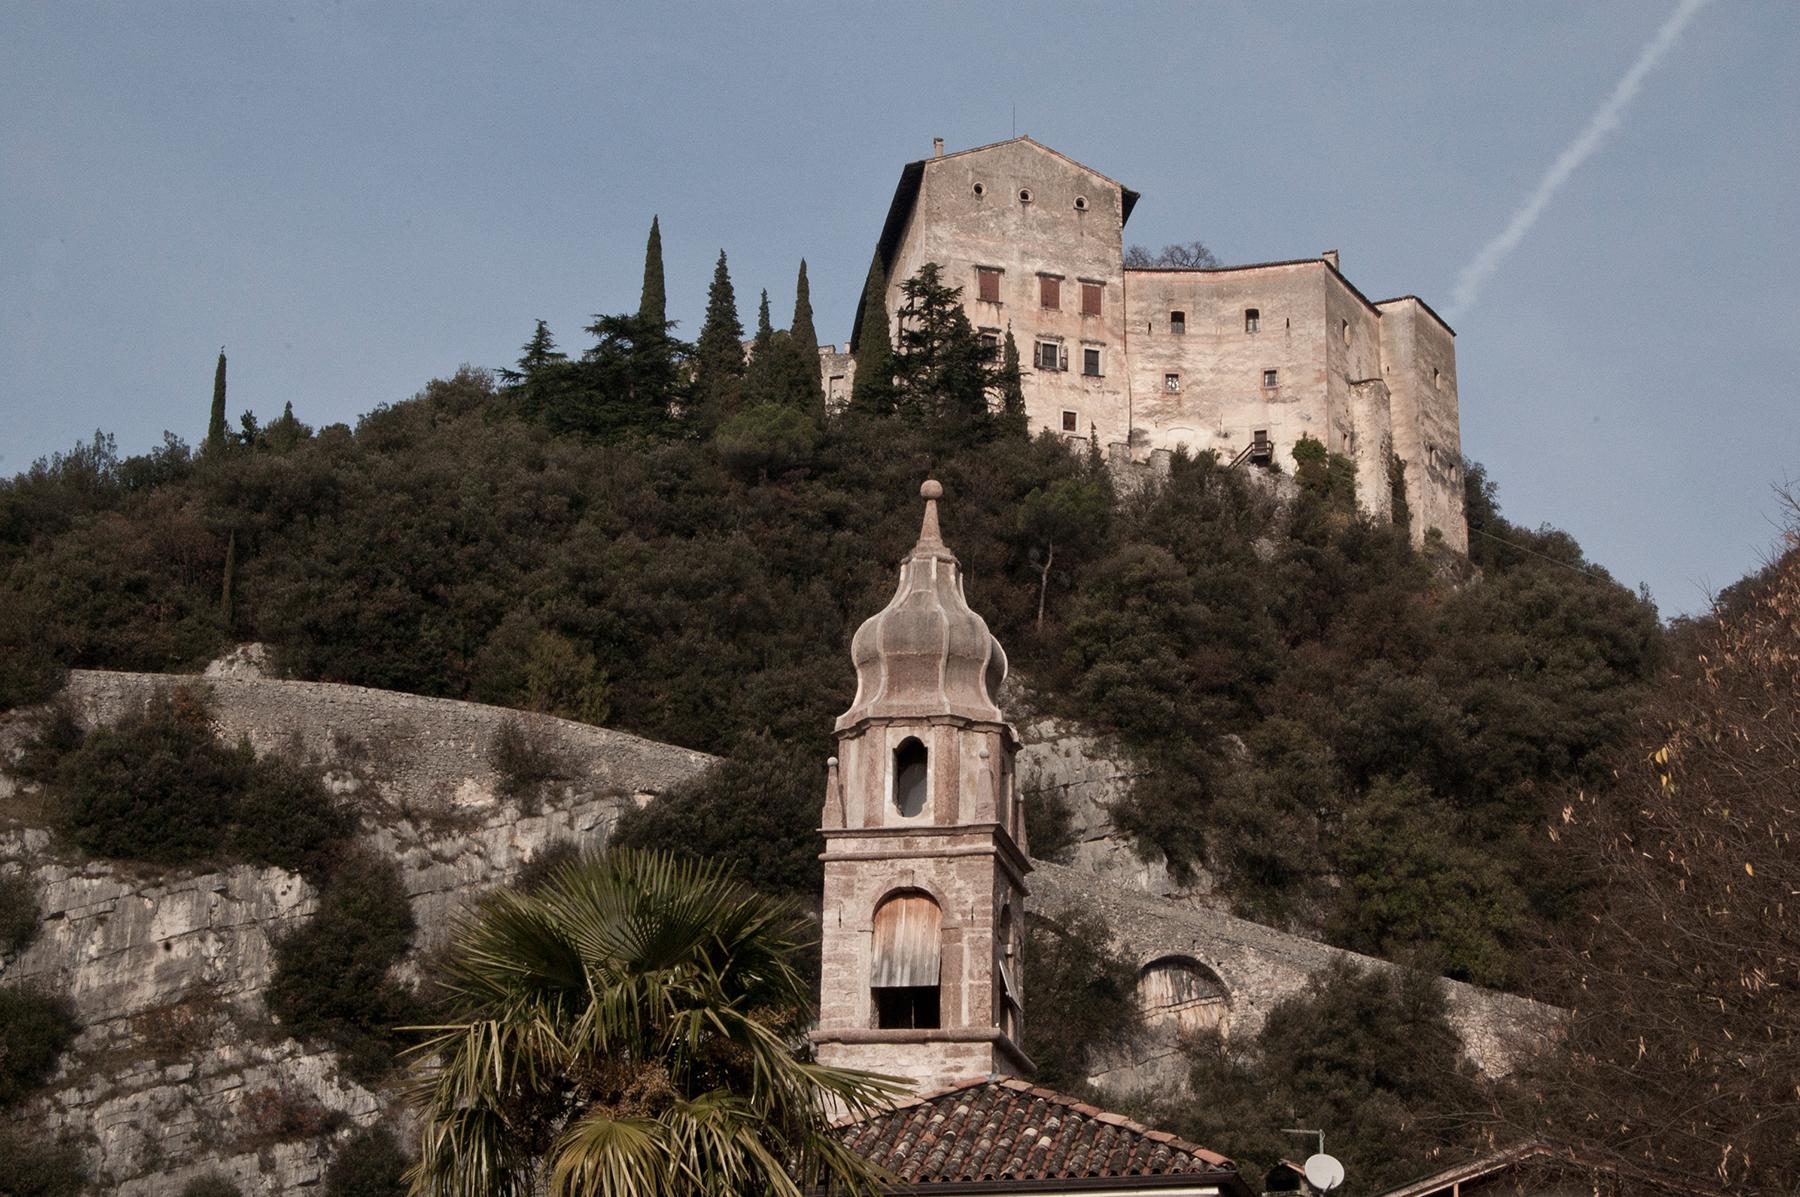 Castel Madruzzo